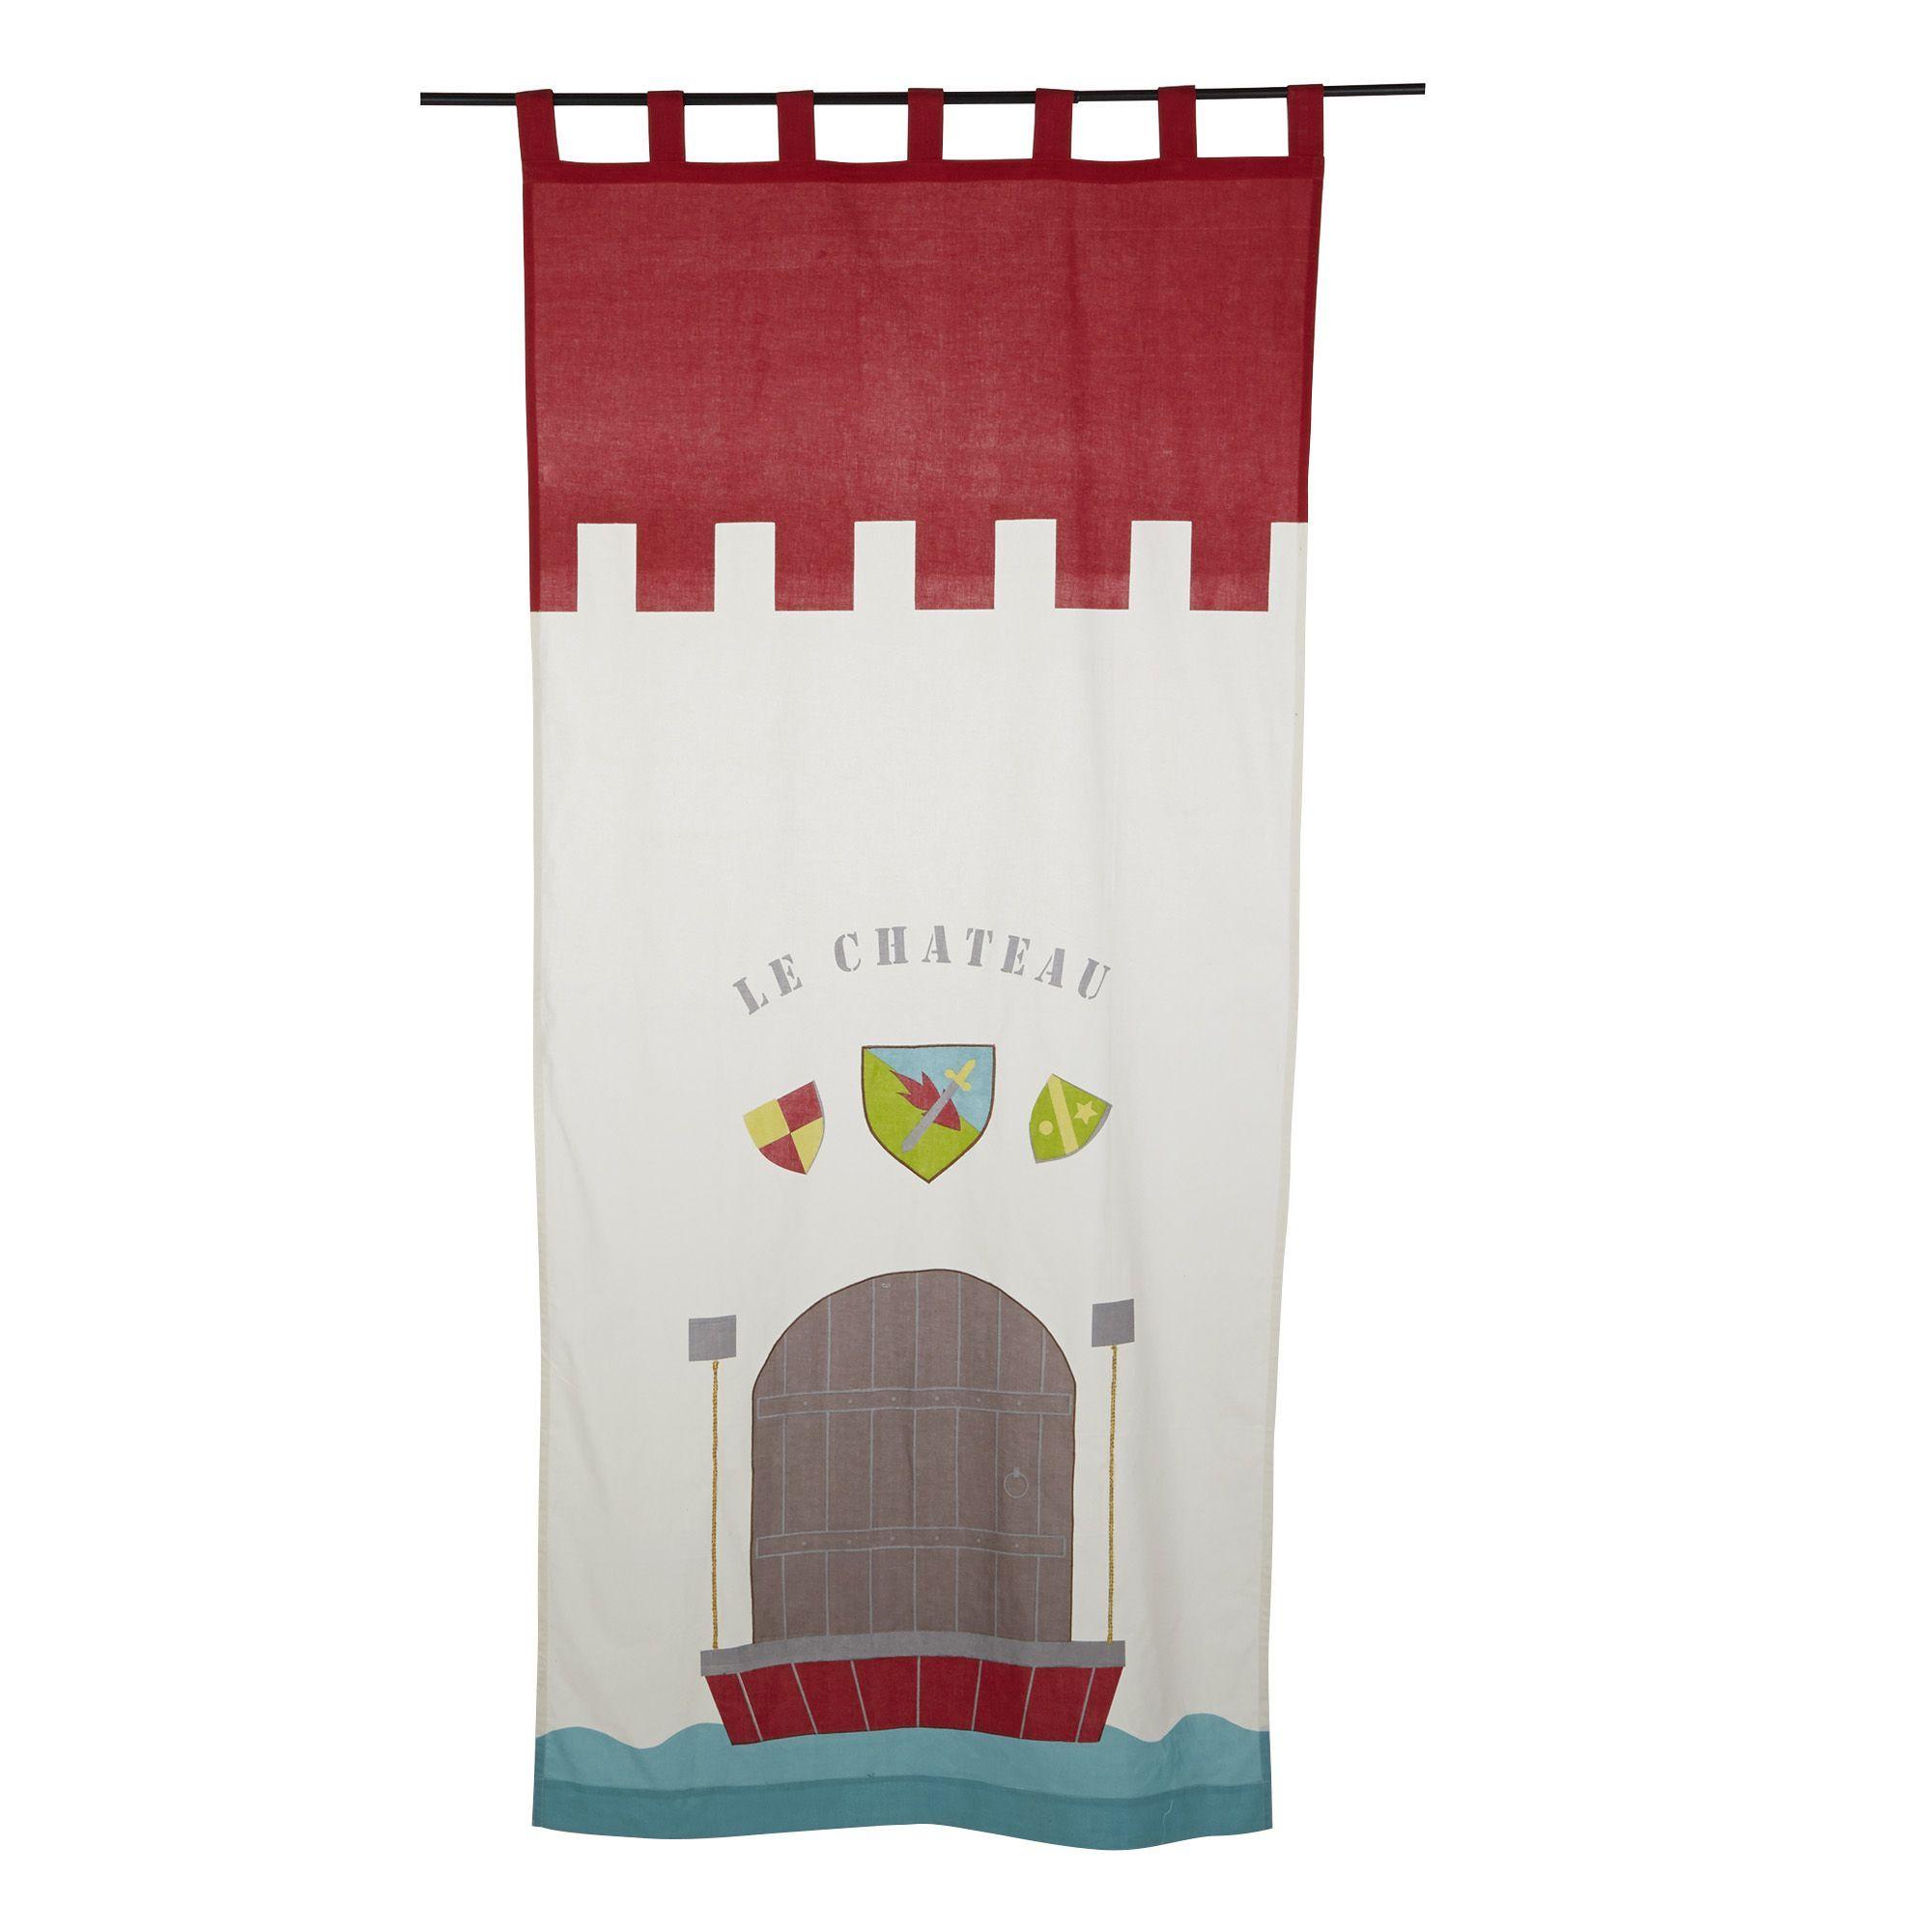 rideau pattes 110x250cm multicolore chevalier. Black Bedroom Furniture Sets. Home Design Ideas